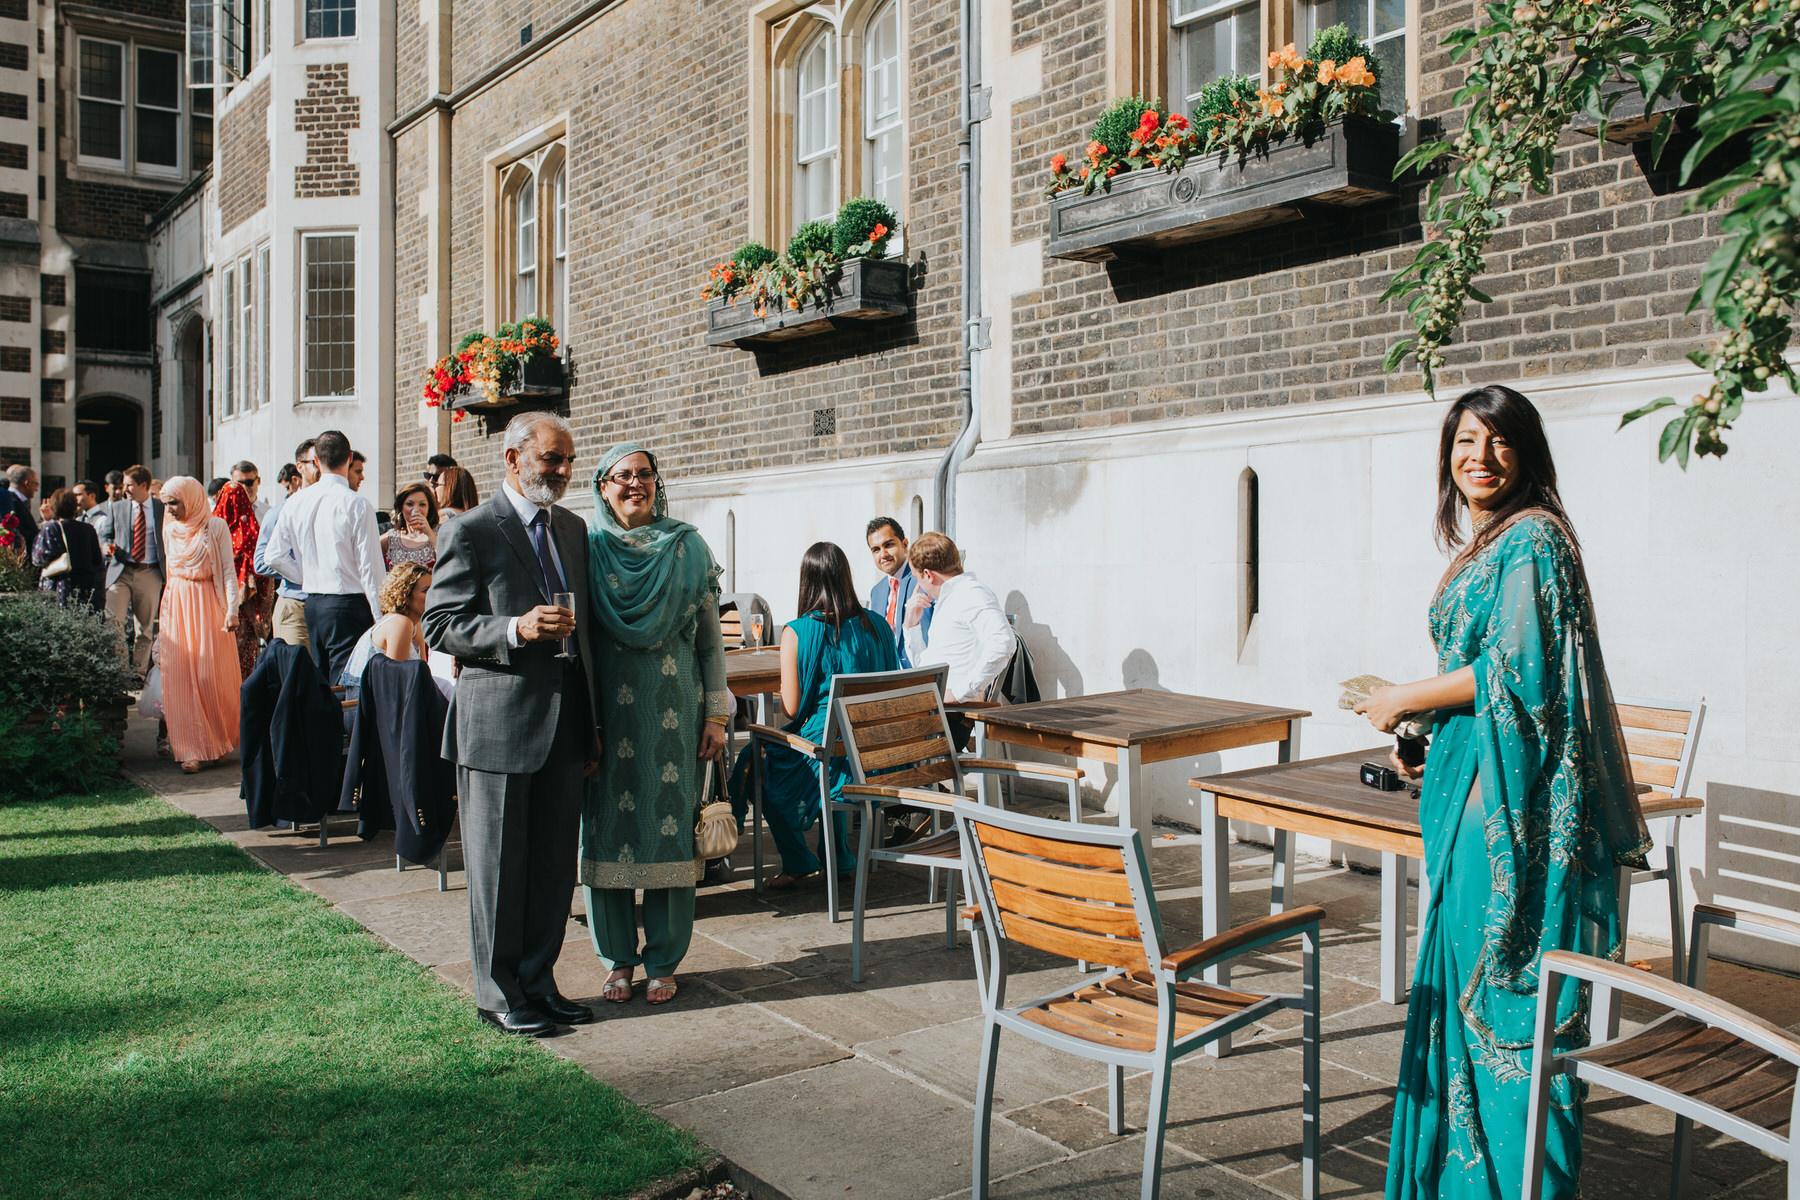 121-Anglo-Asian-Wedding-Middle-temple-garden-guest-photos.jpg